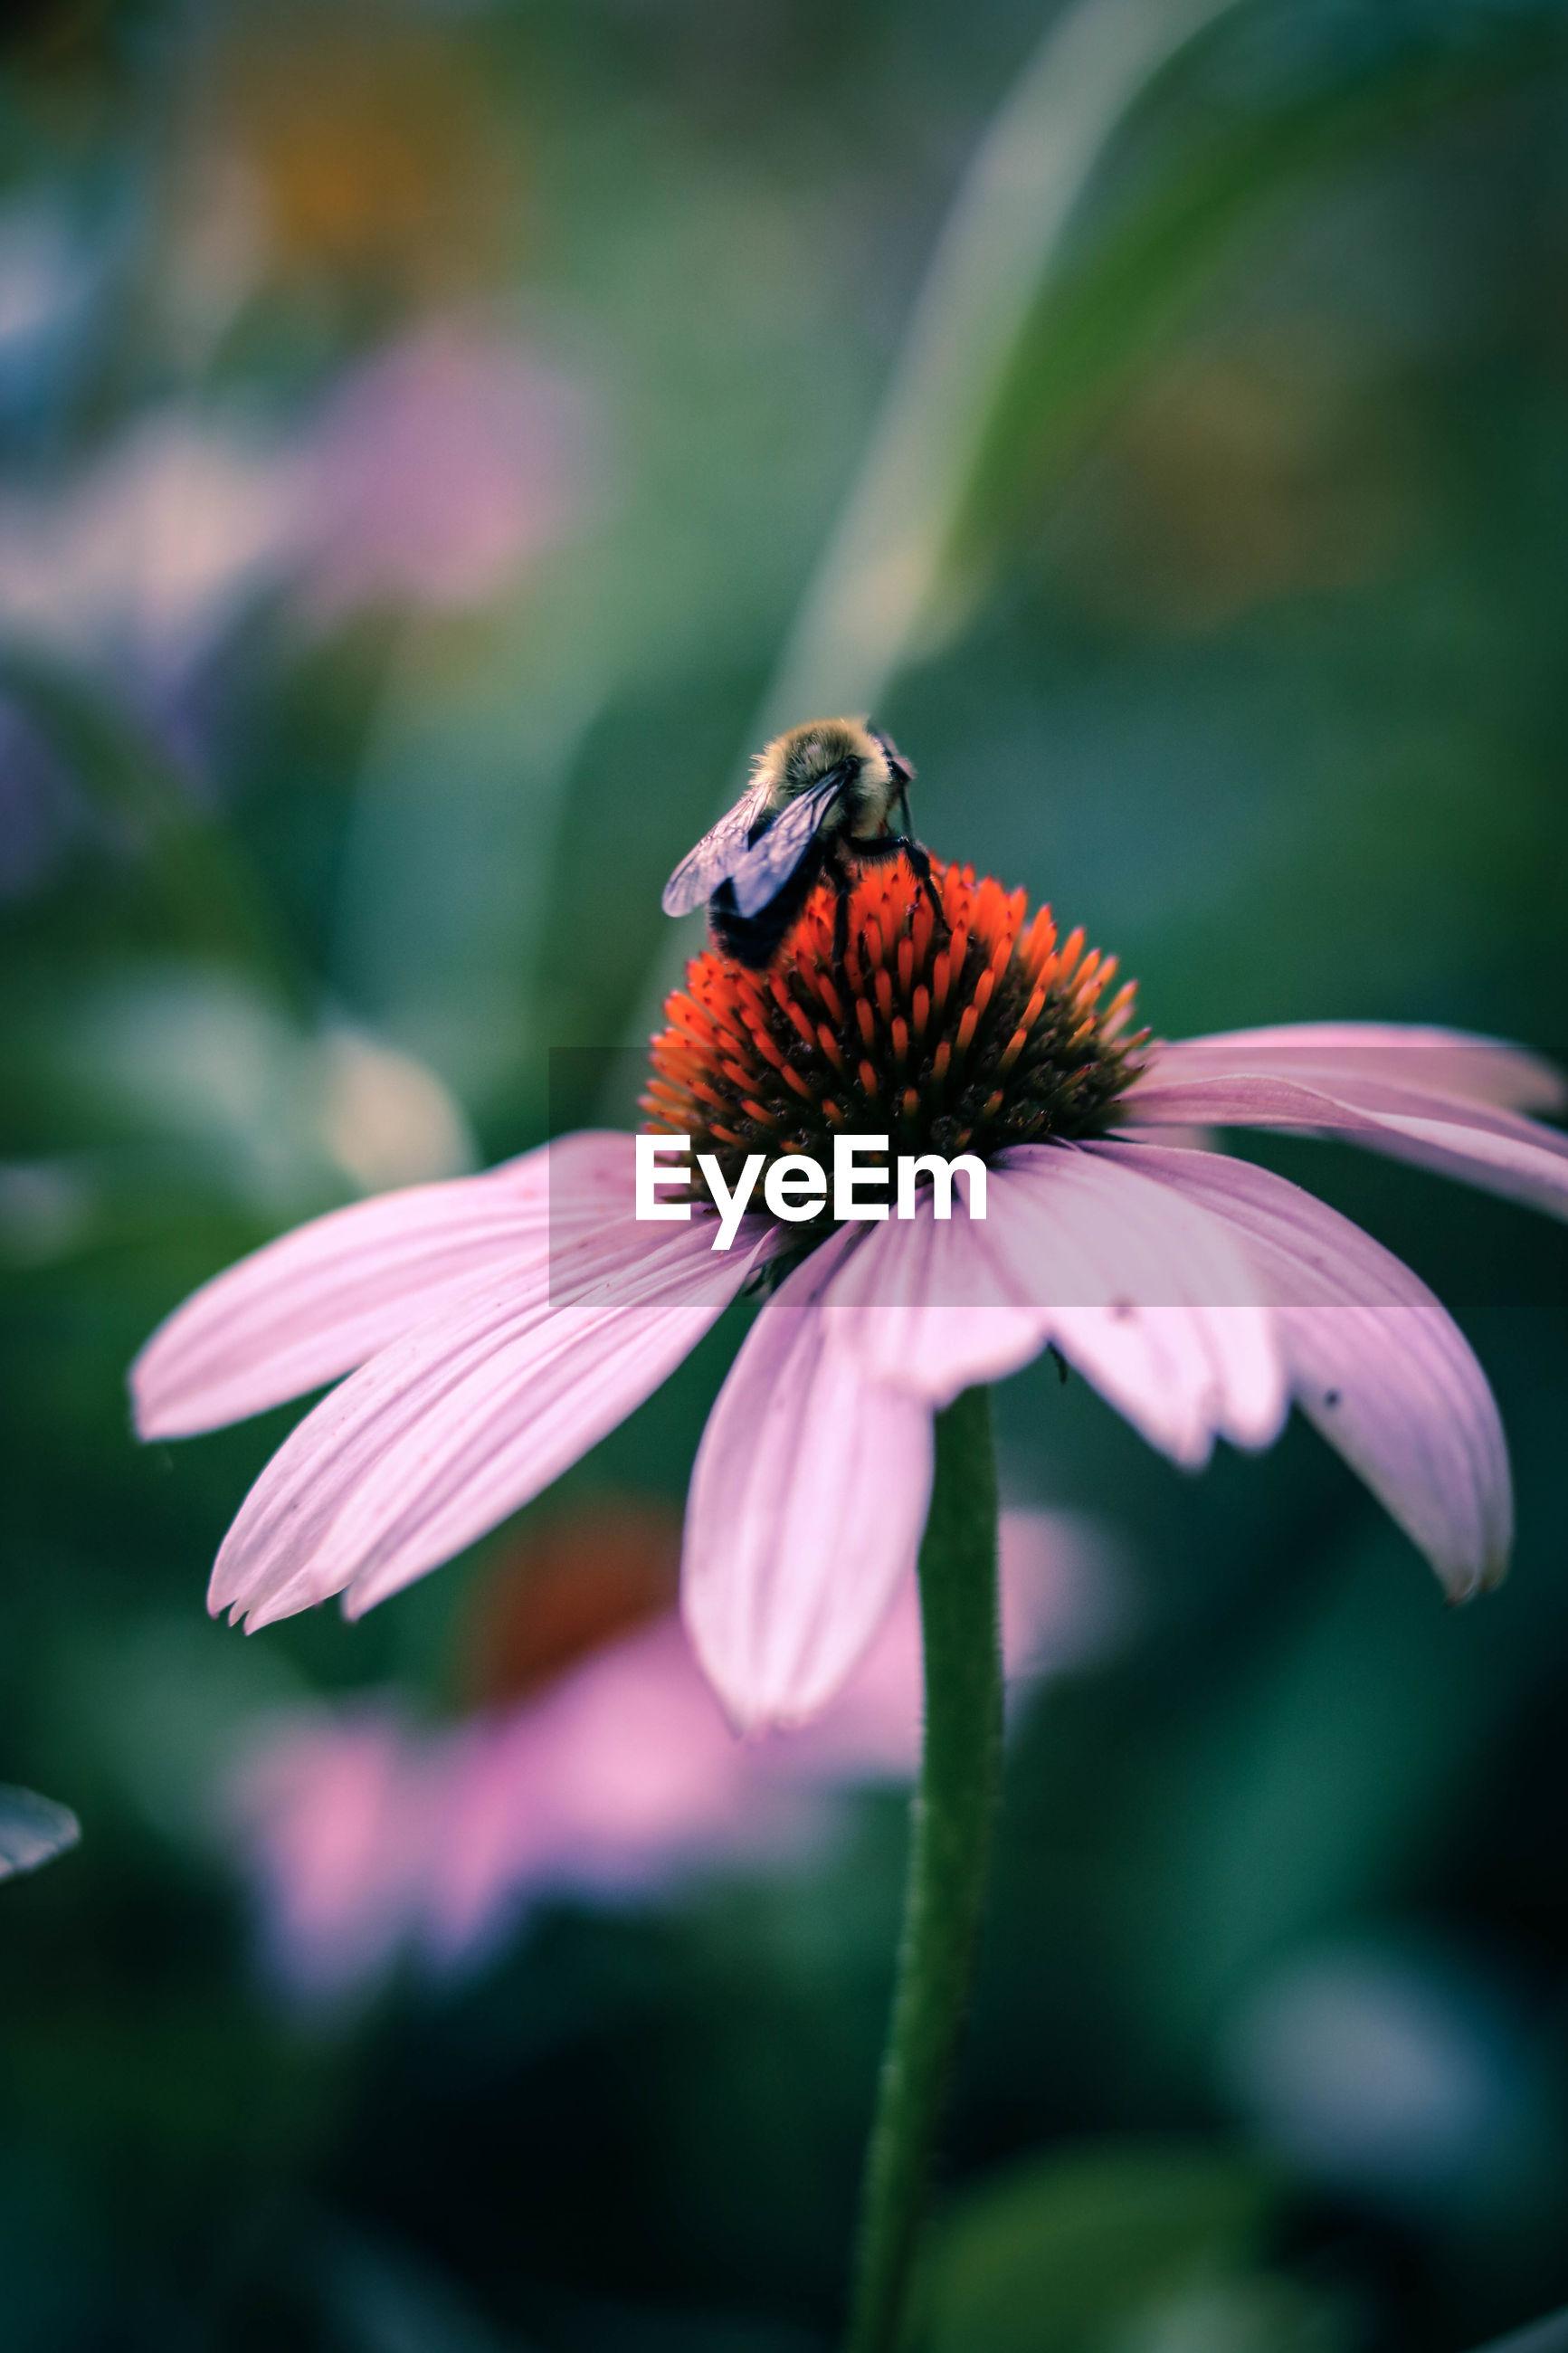 Bee pollinating on eastern purple coneflower